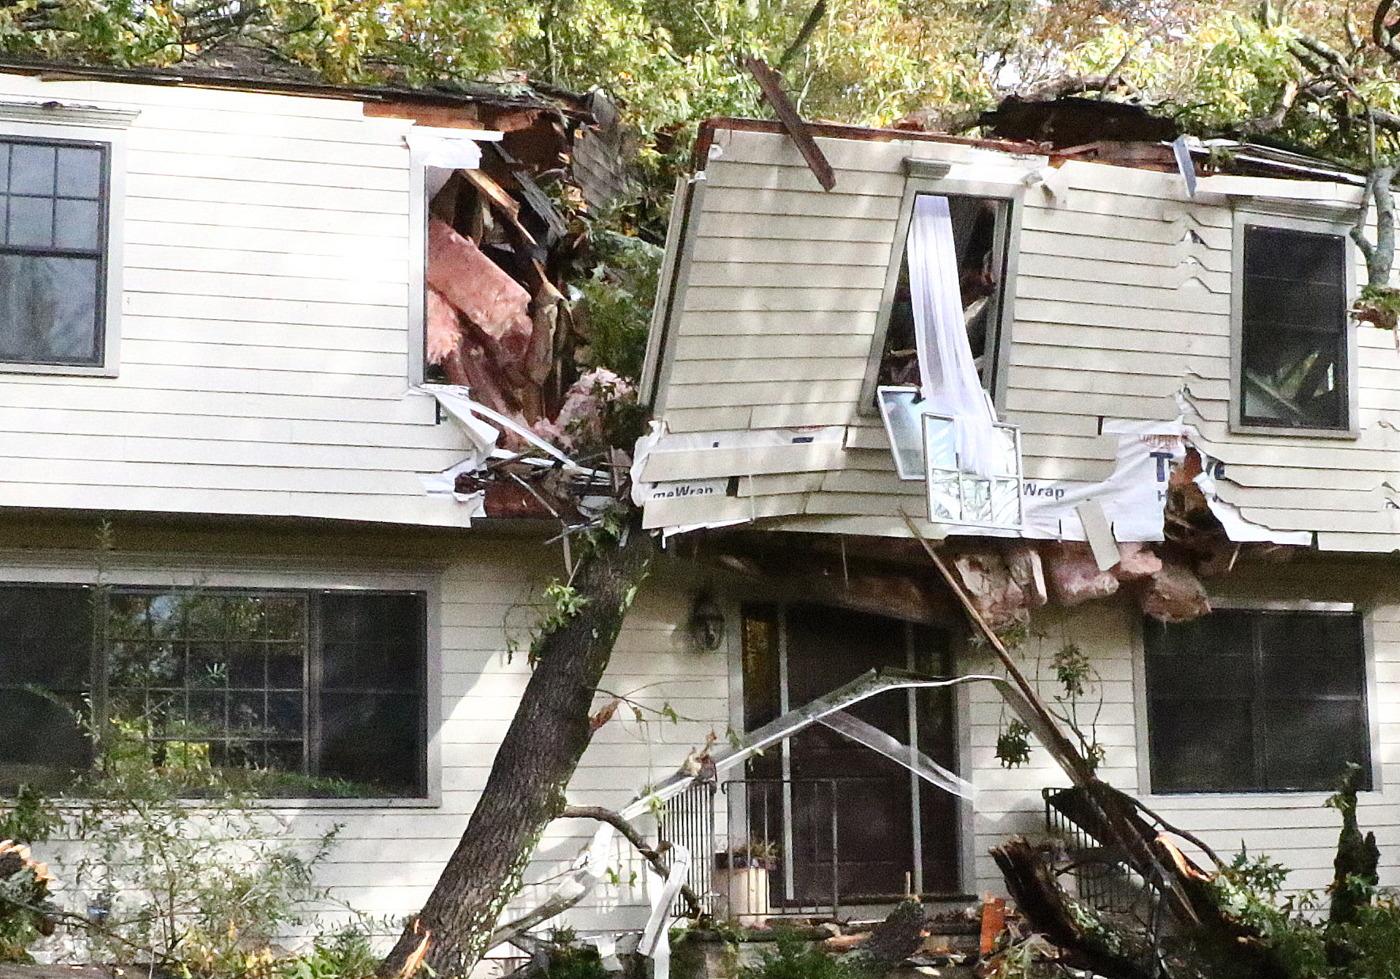 Tree Damage | WestportNow.com, Westport, CT